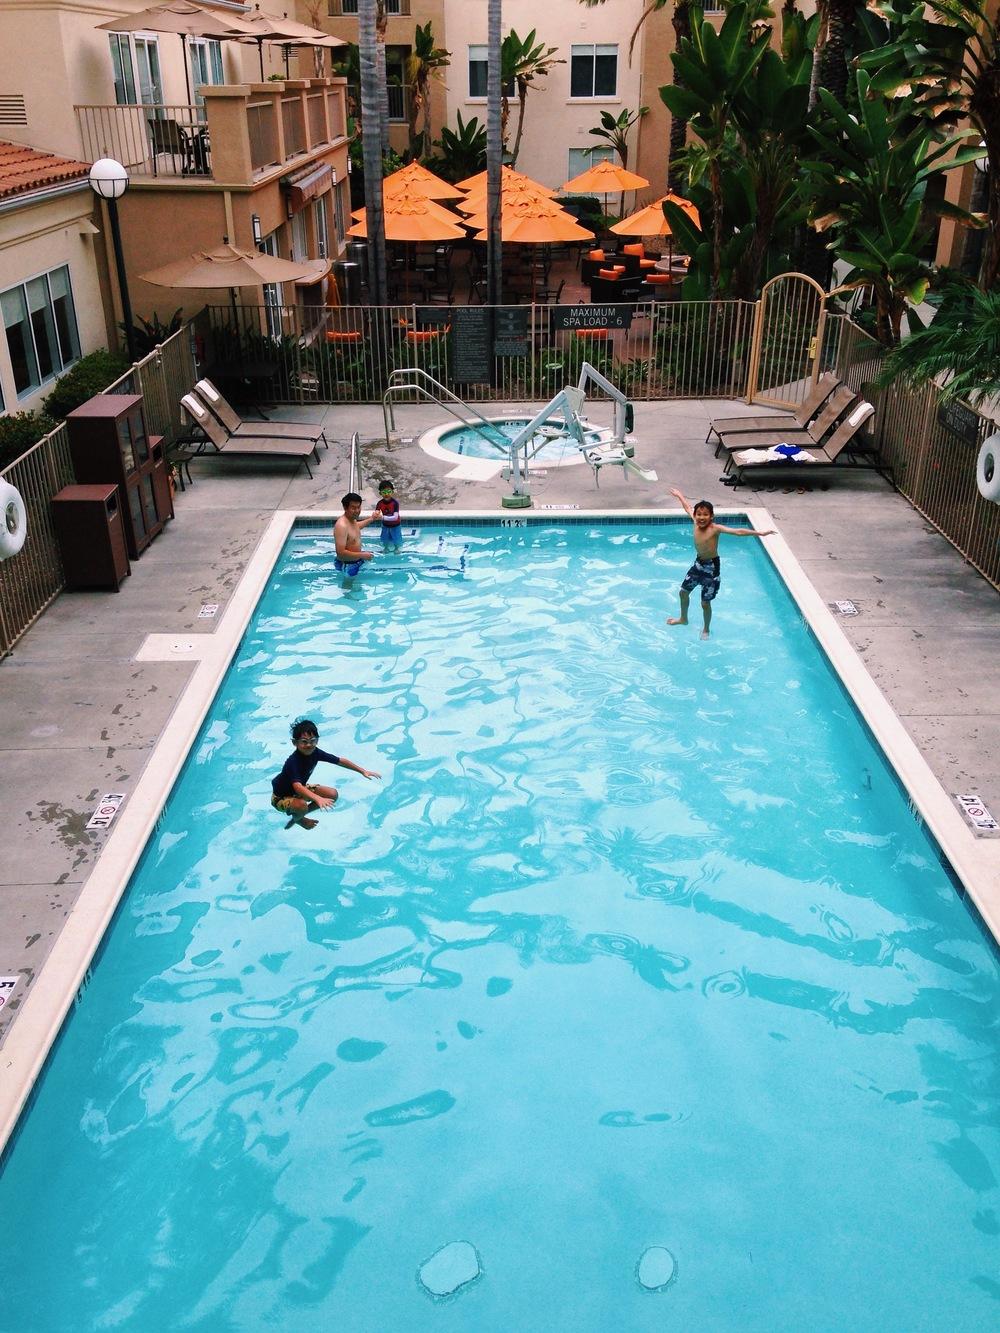 The boys enjoying the Hyatt House pool all to themselves